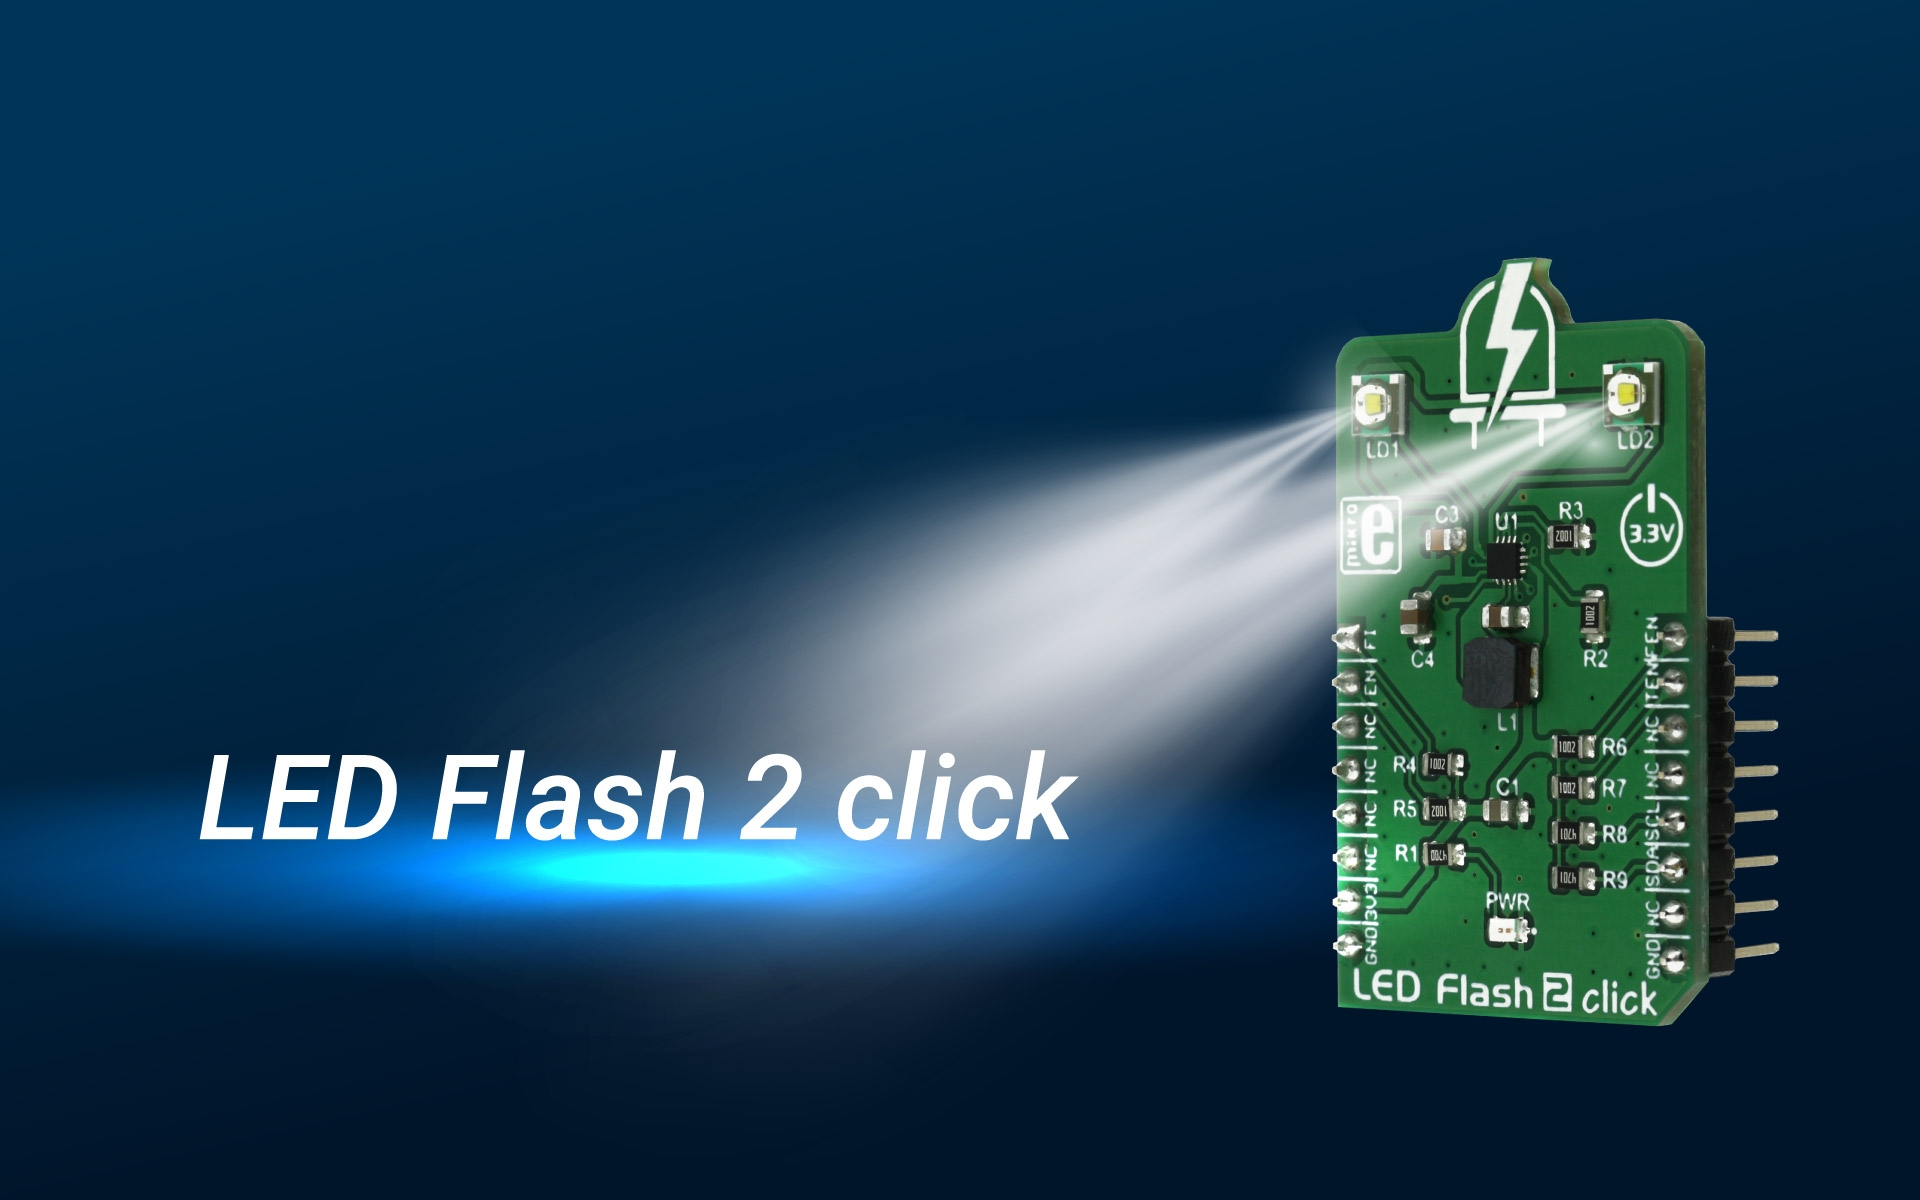 LED Flash 2 click - a high-efficiency flash LED driver